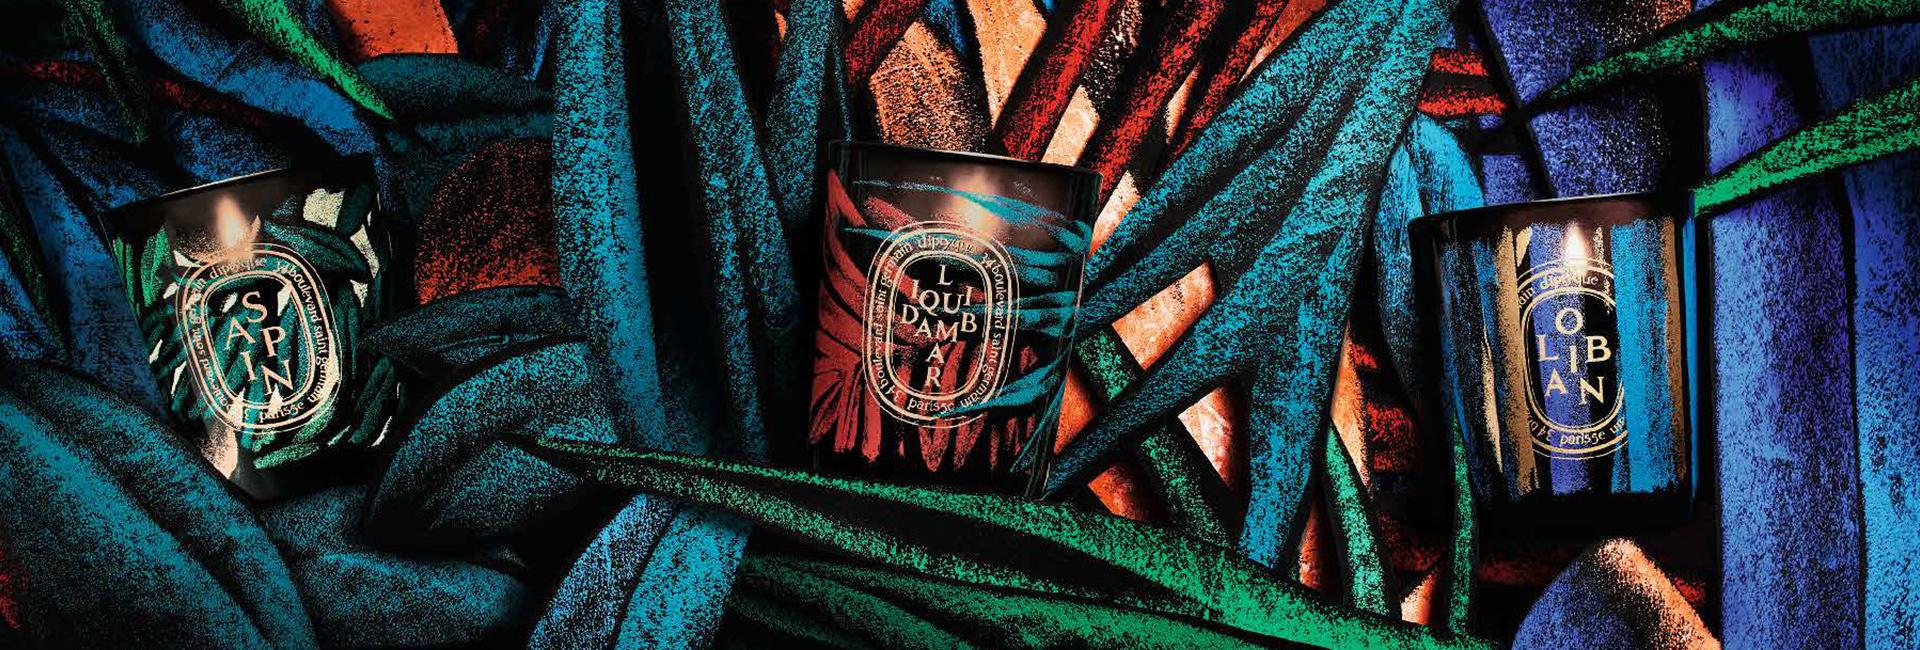 collection-noel-2015-diptyque-bougies-blog-beaute-soin-parfum-homme